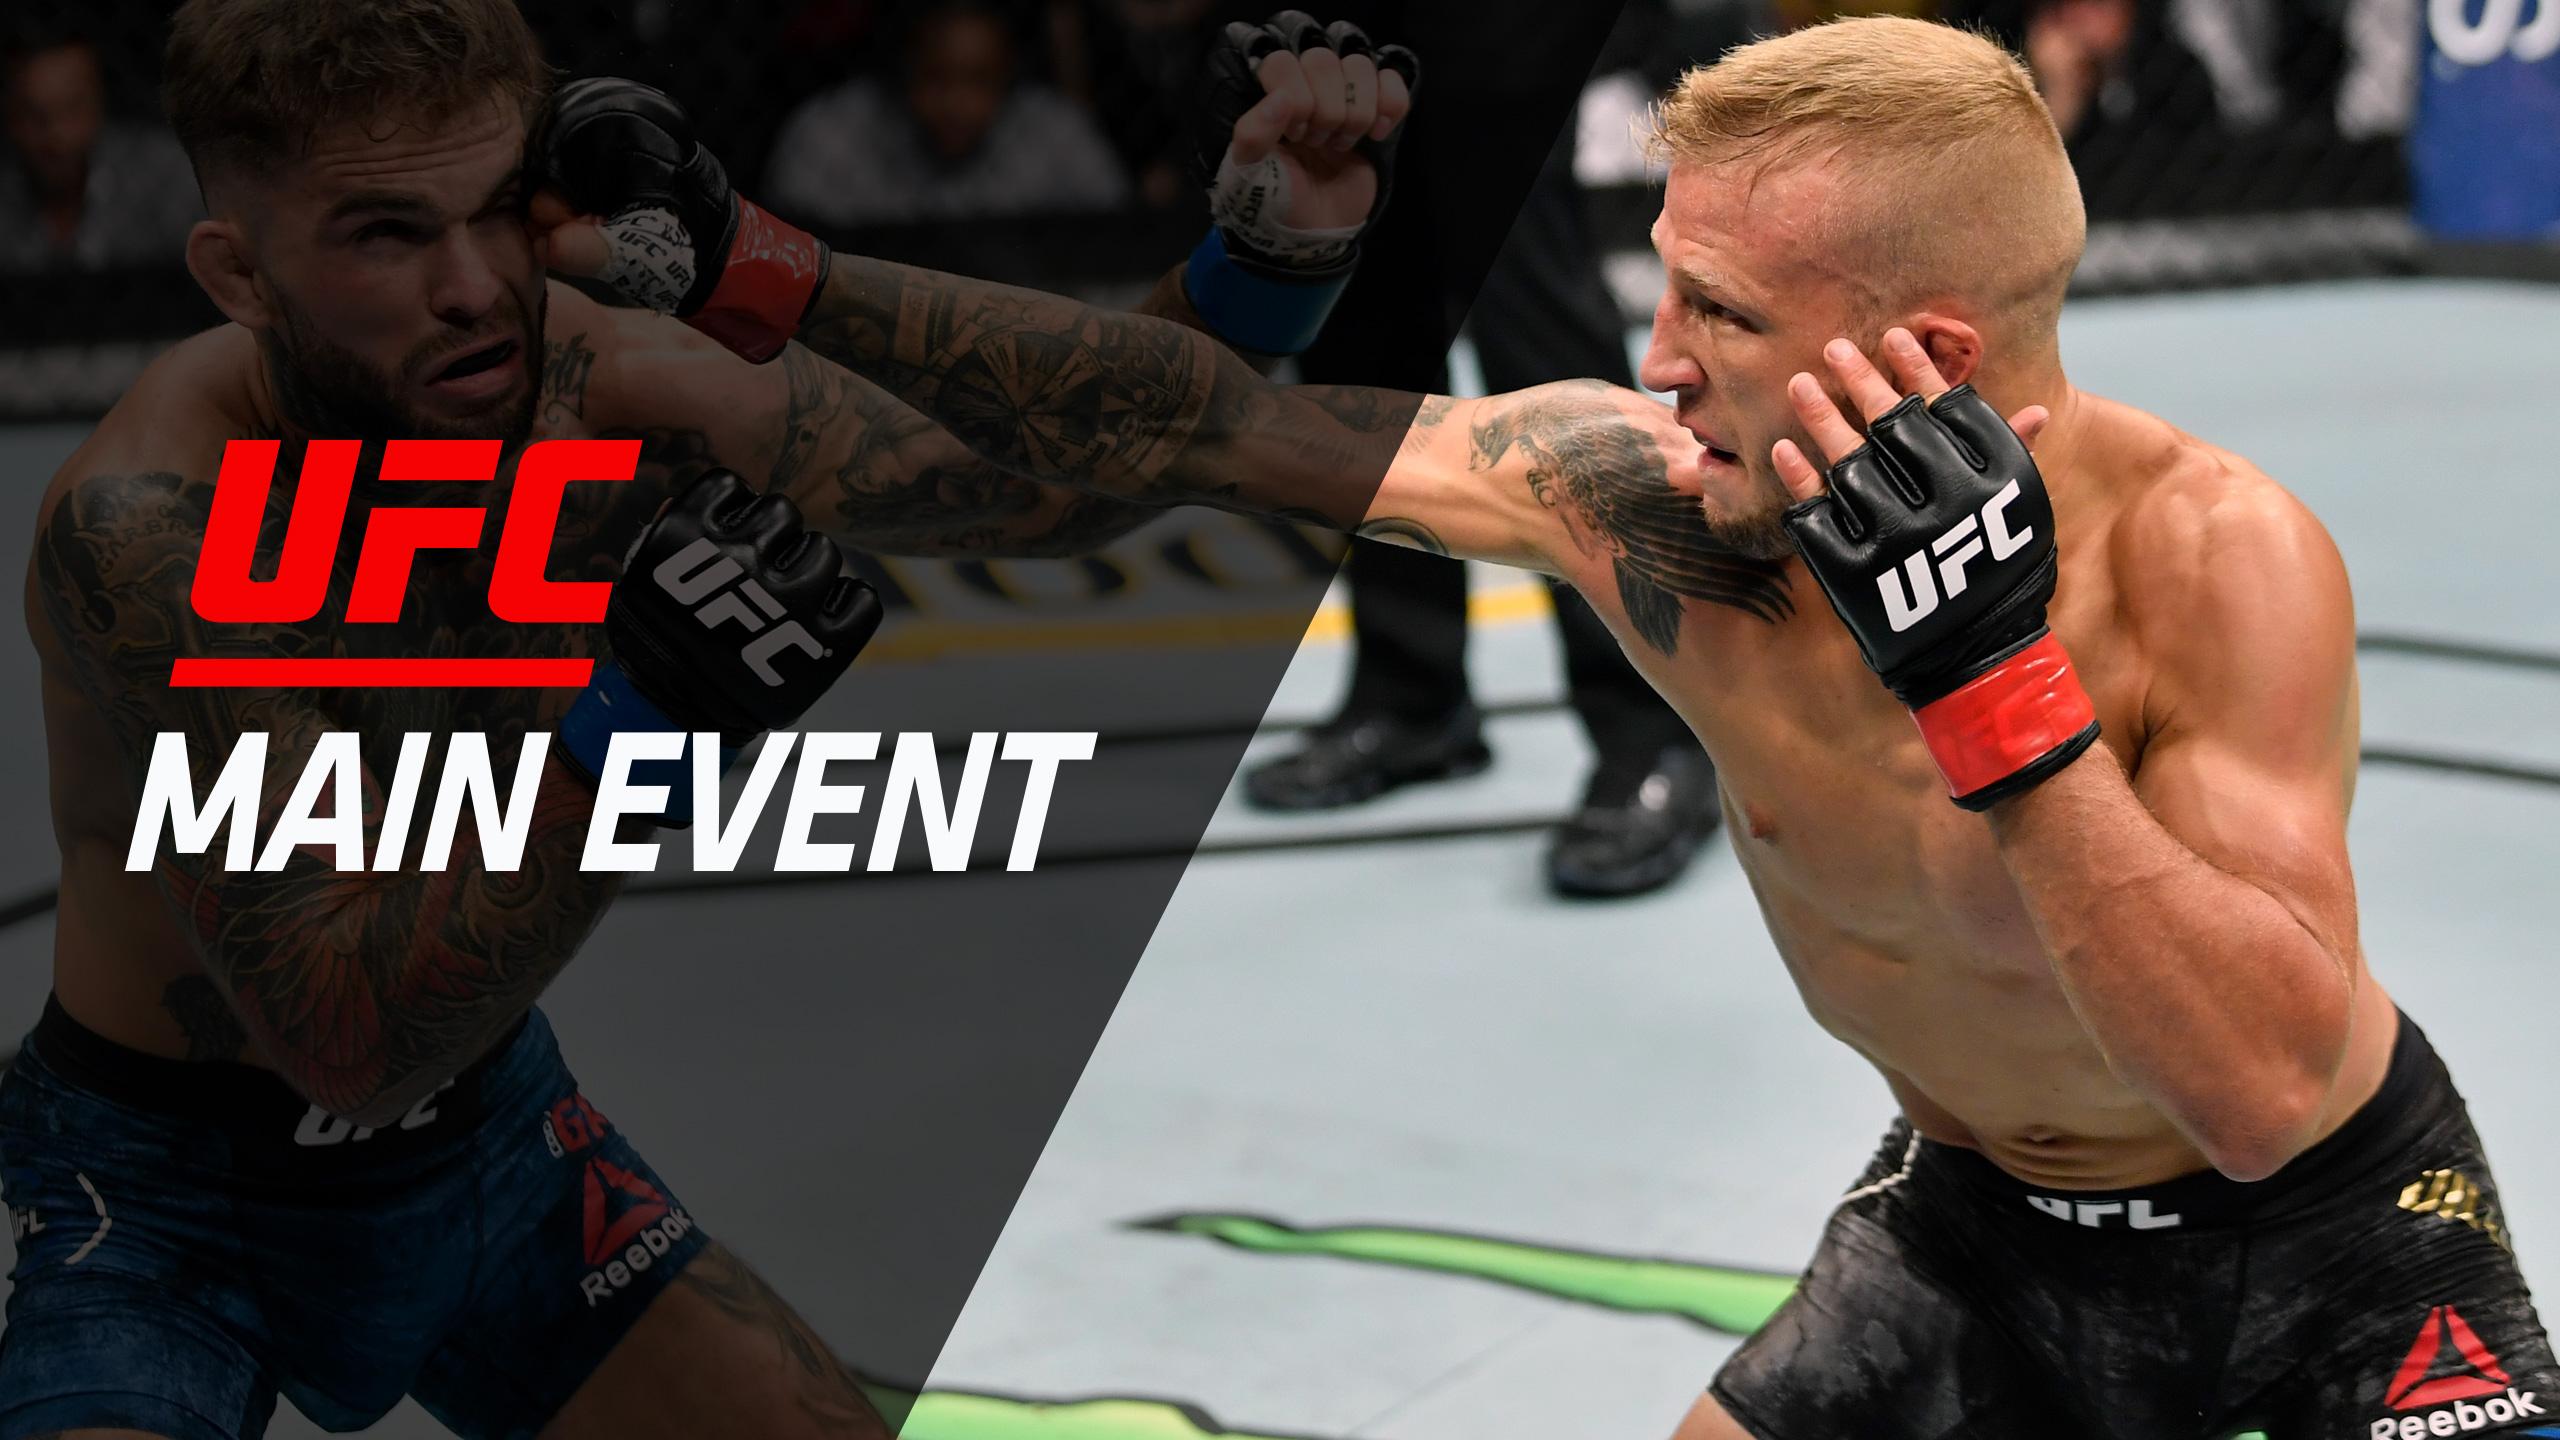 UFC Main Event:Dillashaw vs. Garbrandt 1 & 2